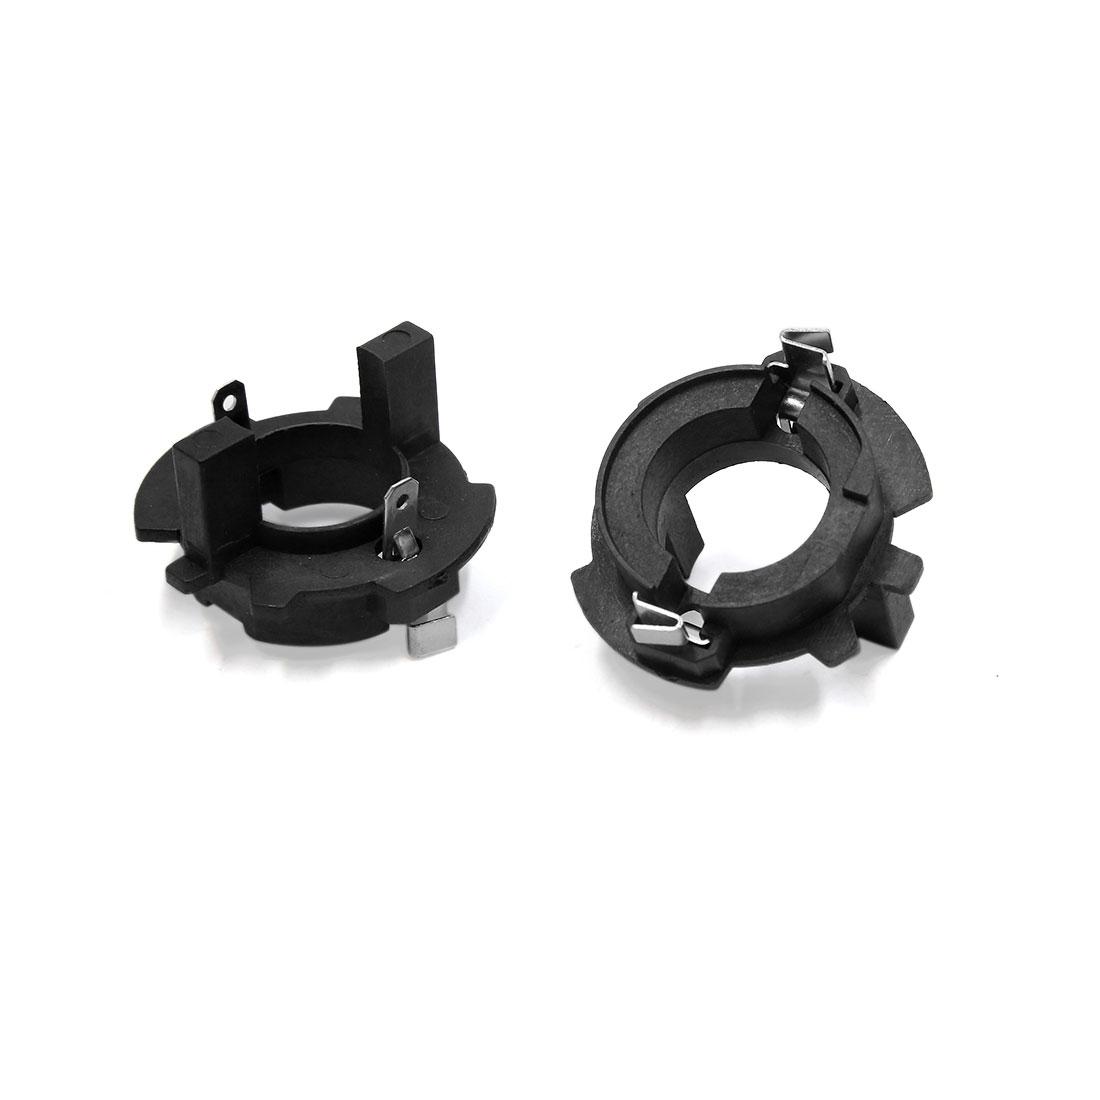 2 Pcs H7 HID Xenon Headlight Bulb Holder Adapter Base for VW Jetta Touran